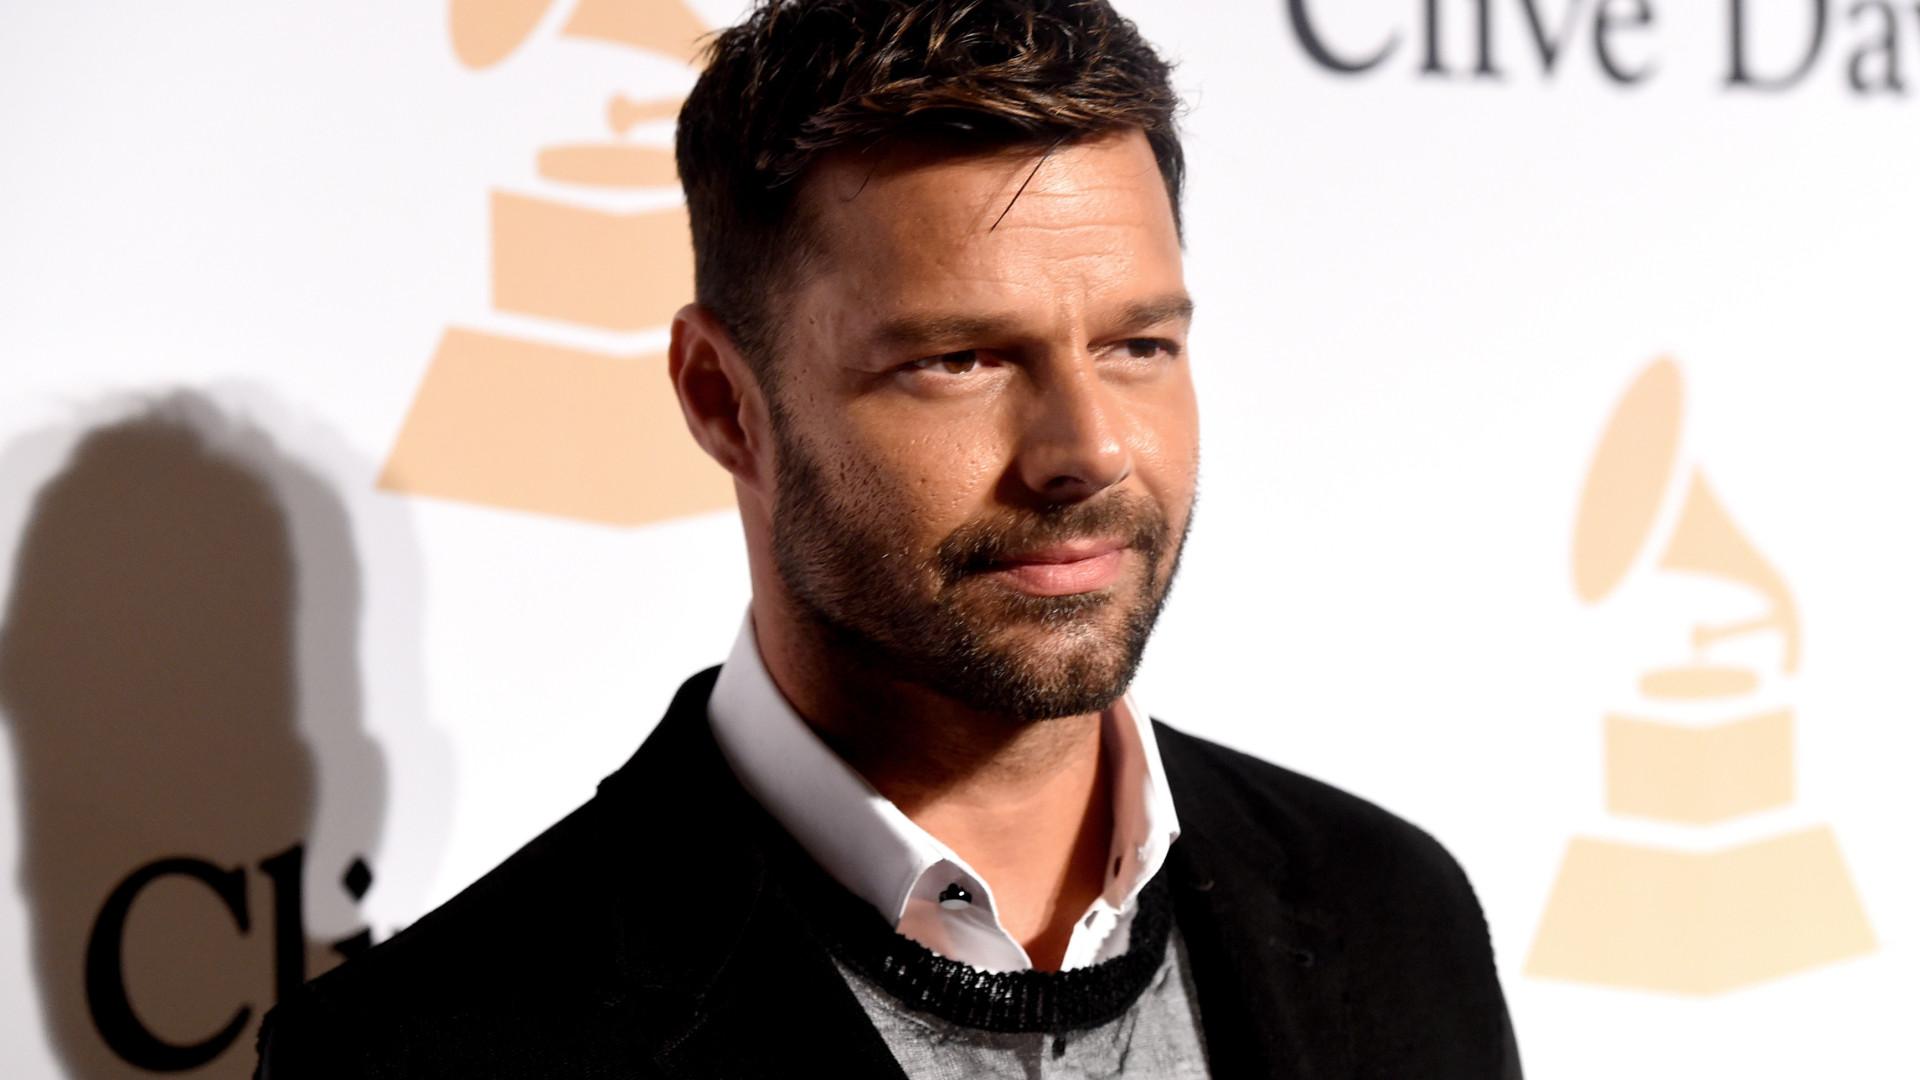 Ricky Martin anuncia chegada de Lucia; cantor é pai pela terceira vez